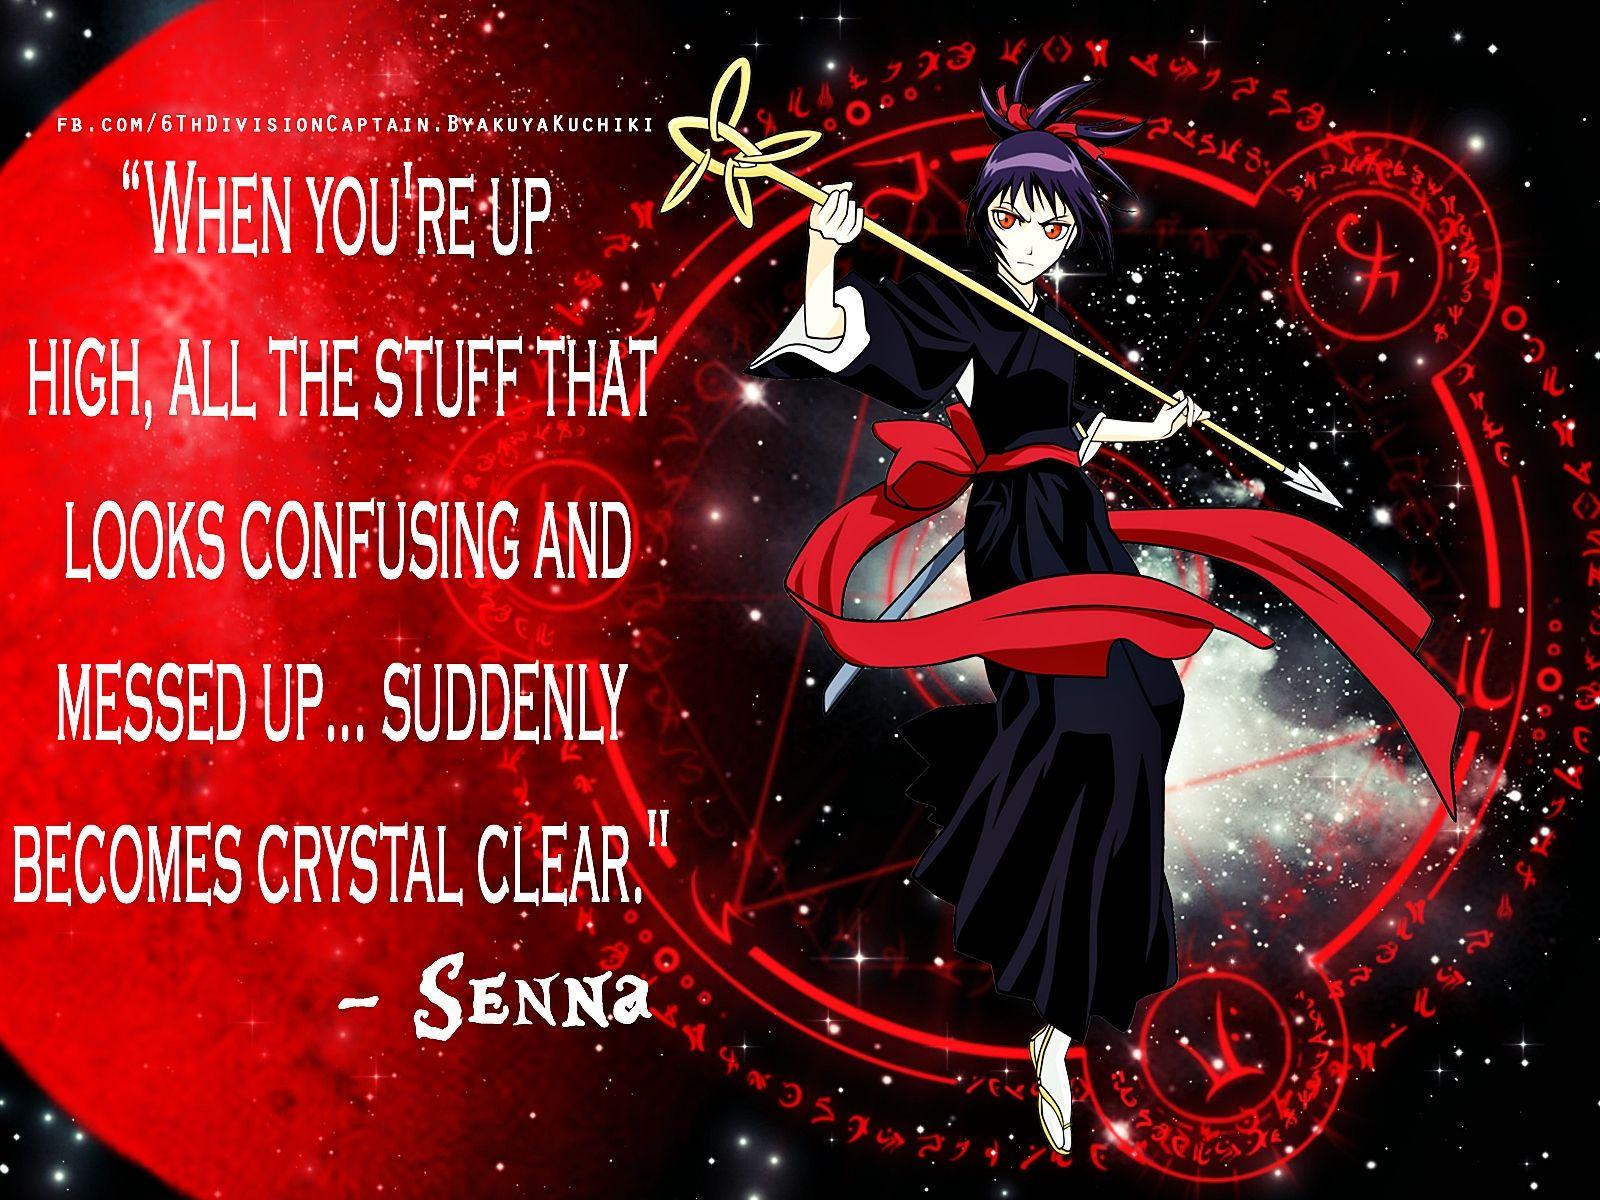 Senna Quote by ishi-kuchiki.deviantart.com on @deviantART